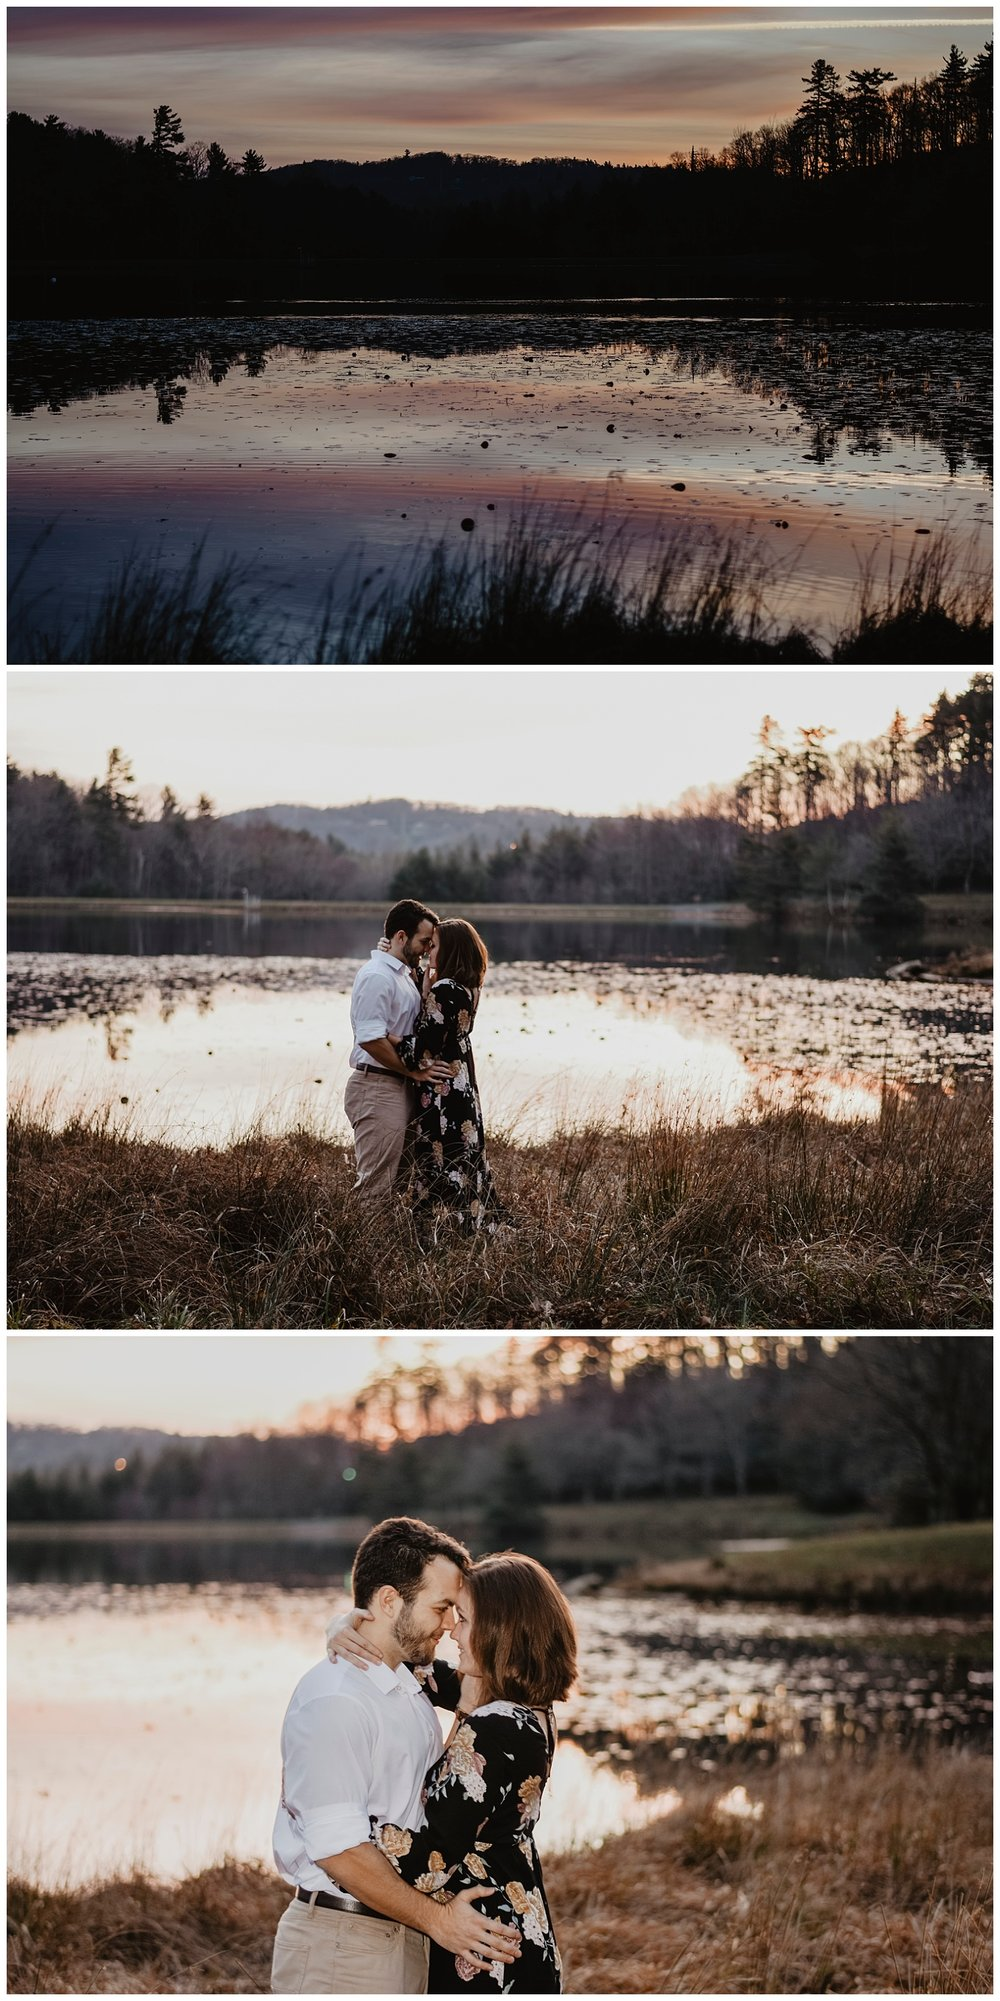 Bass Lake-Elopement-North Carolina-Elopement Photographer 1.jpg